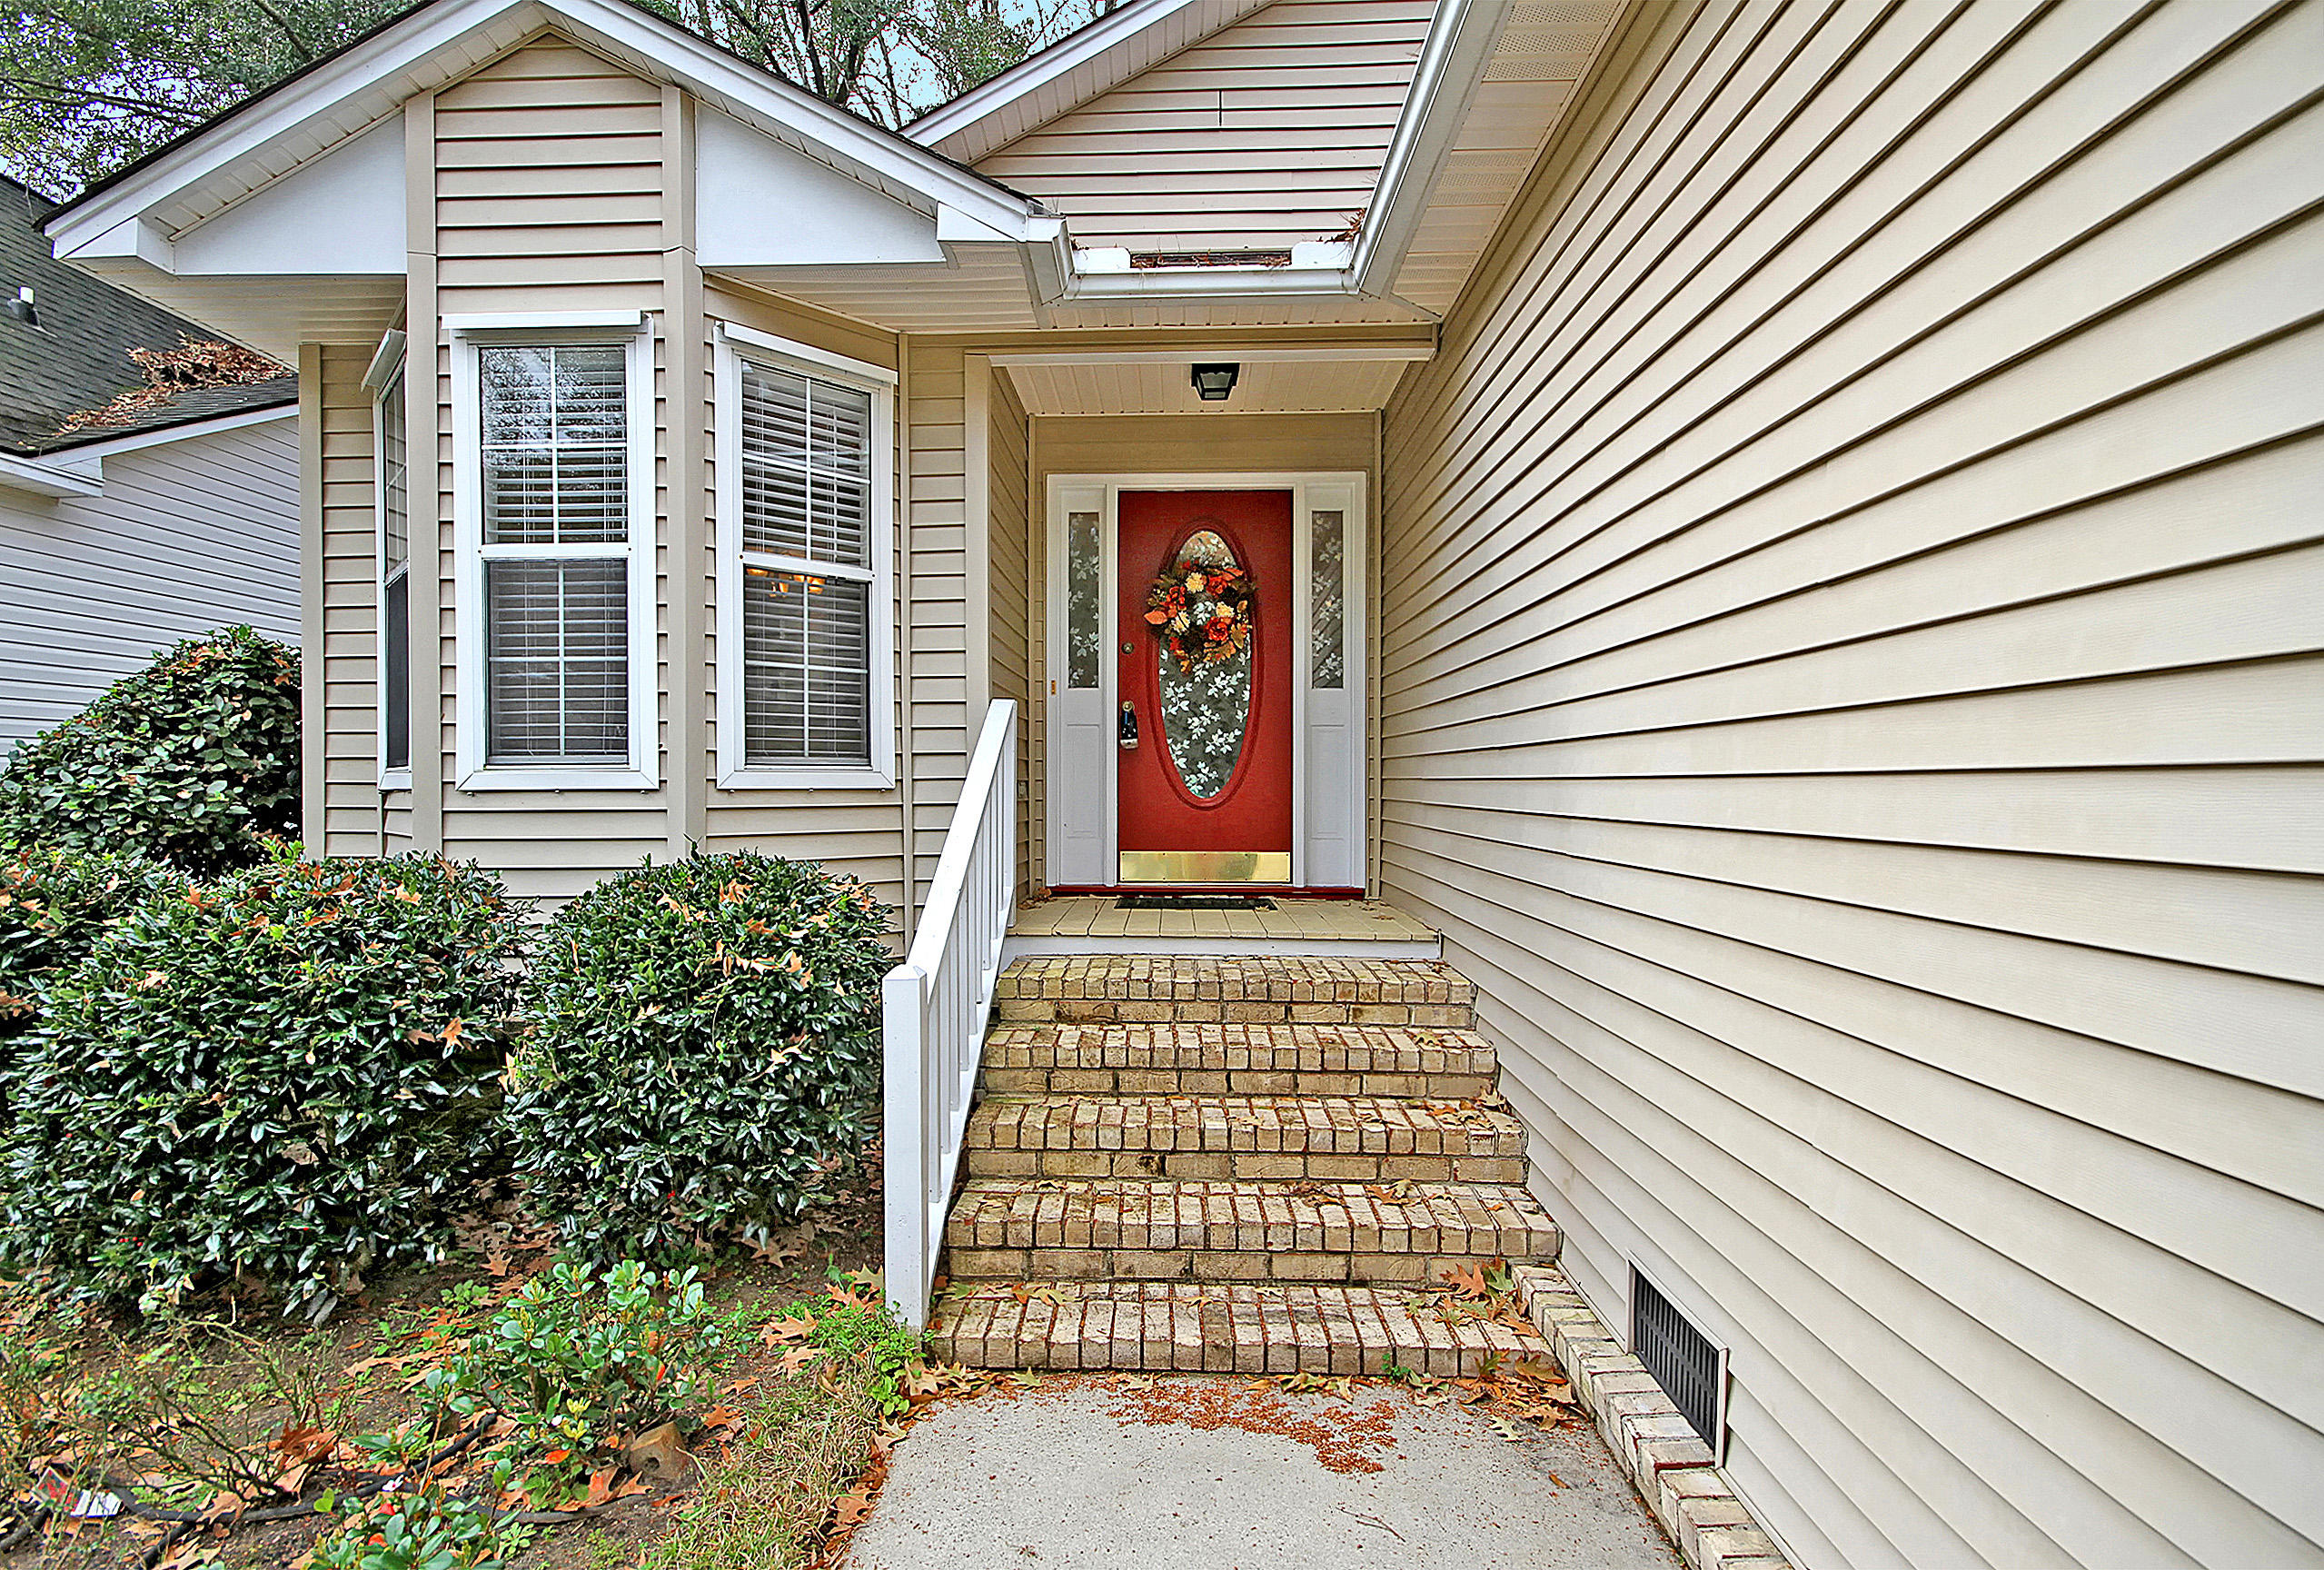 Harbor Place Homes For Sale - 845 Harbor Pl, Charleston, SC - 13